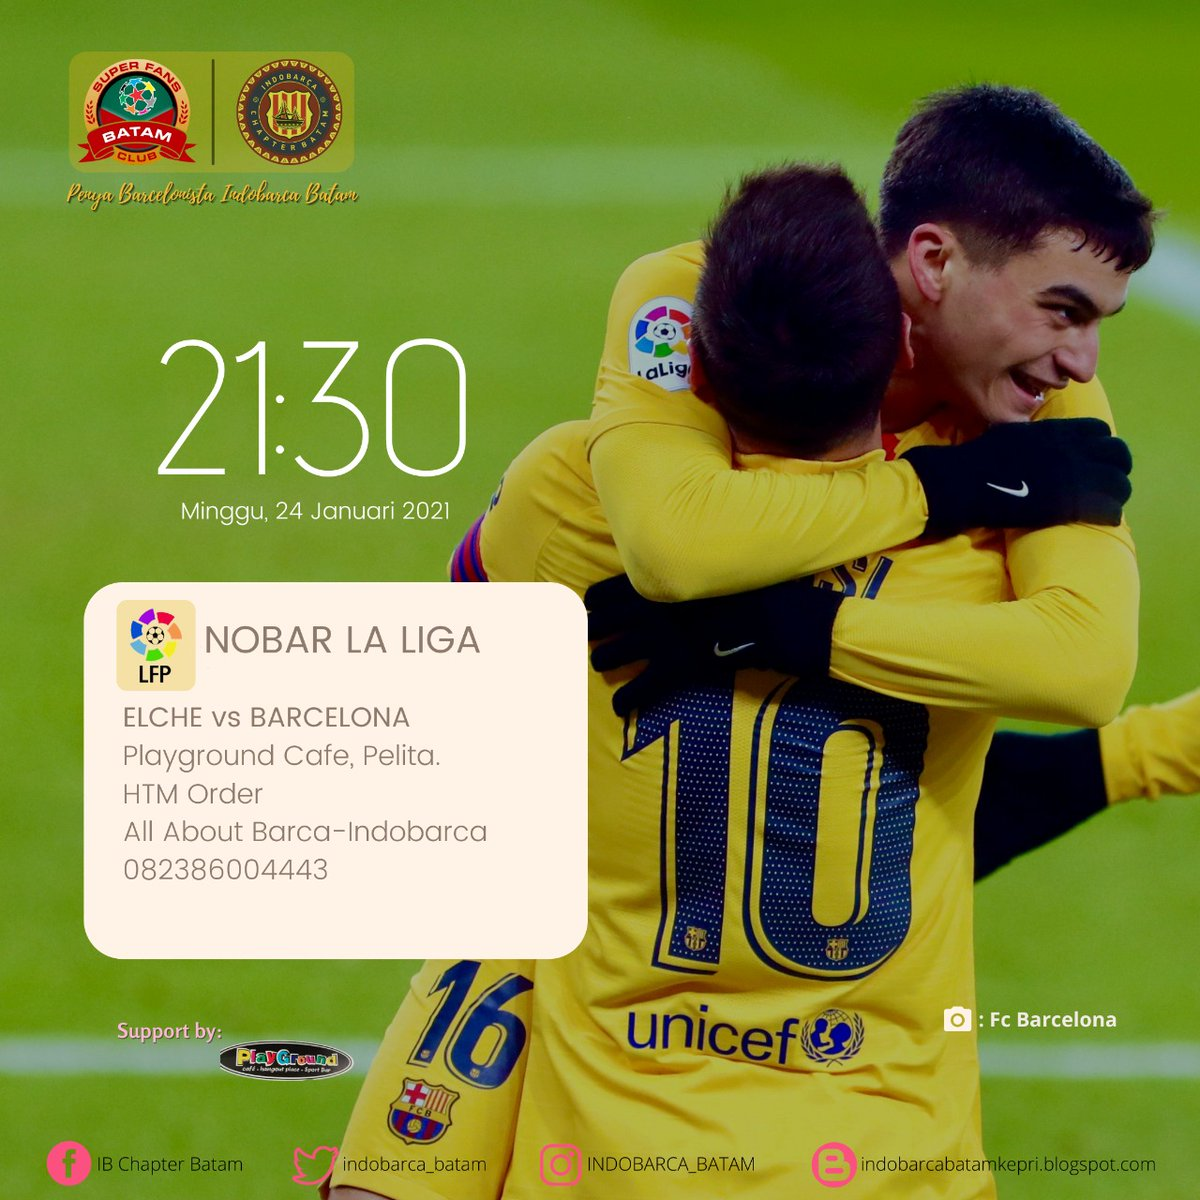 . EVENT IB CHAPTER BATAM! .  - NOBAR LA LIGA Jornada XX: Elche vs Barcelona . 📅 Minggu, 24 Januari 2021 🏠 @playgroundcafee_batam . 🕗 OG 21.30 WIB 💰 Order 👕 Barca/Indobarca . 📱082386004443 .  Skuy dinner + nobar di PG! 🔵🔴 . #ForcaBarca  #IndobarcaChapterBatam